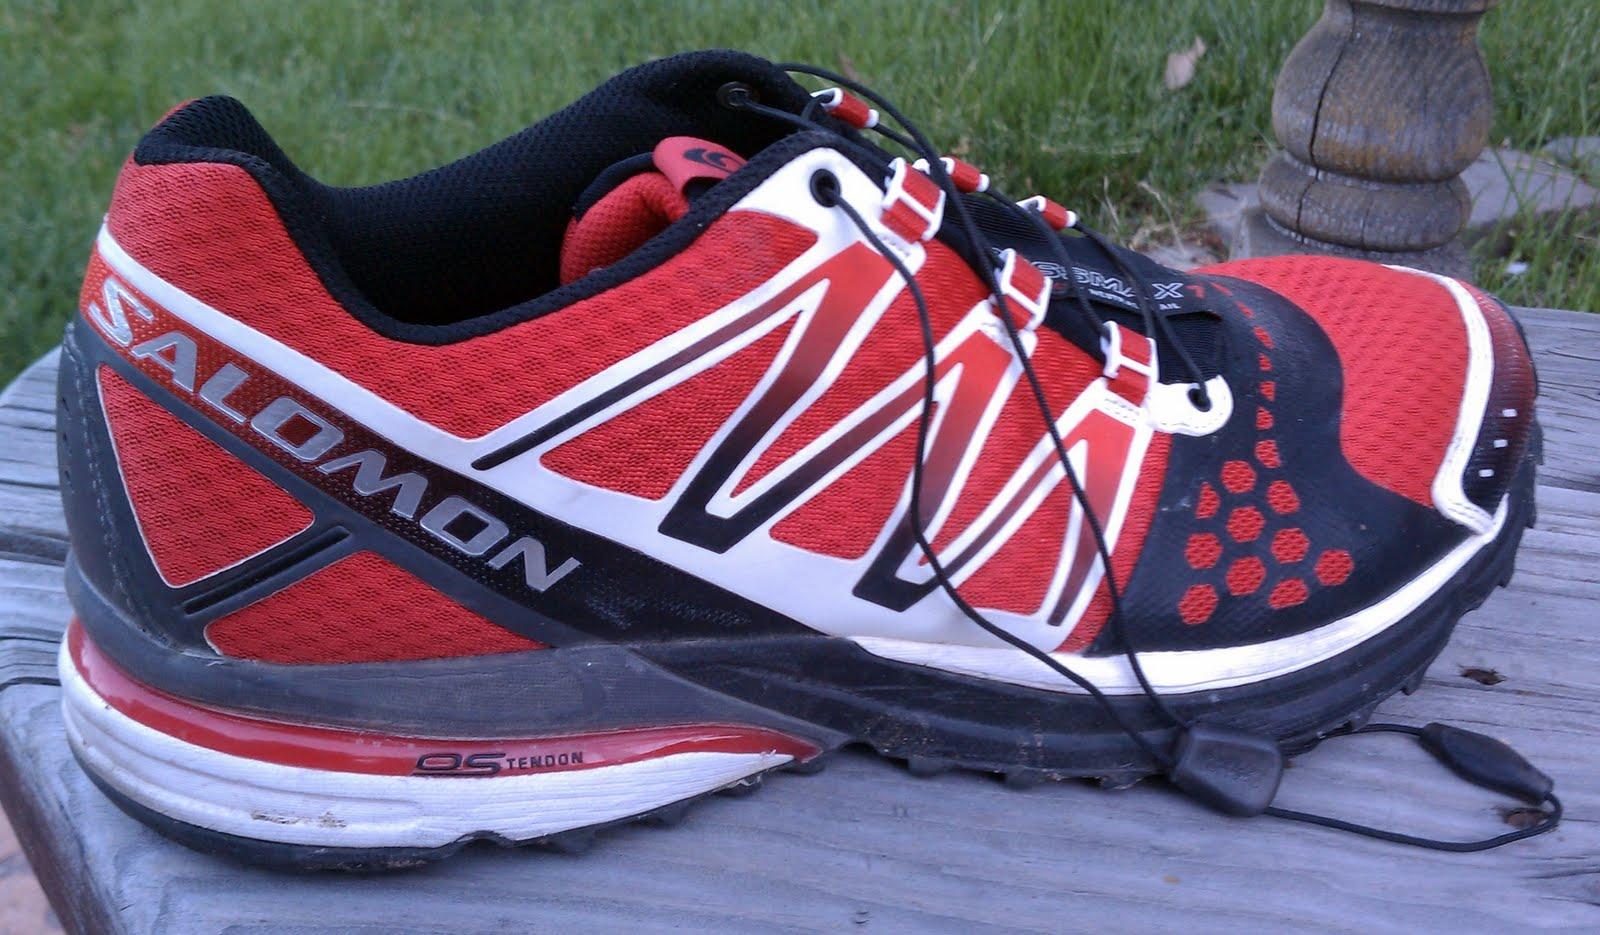 100% authentique a0046 05cbb Running 'round Reno: Salomon XR Crossmax review